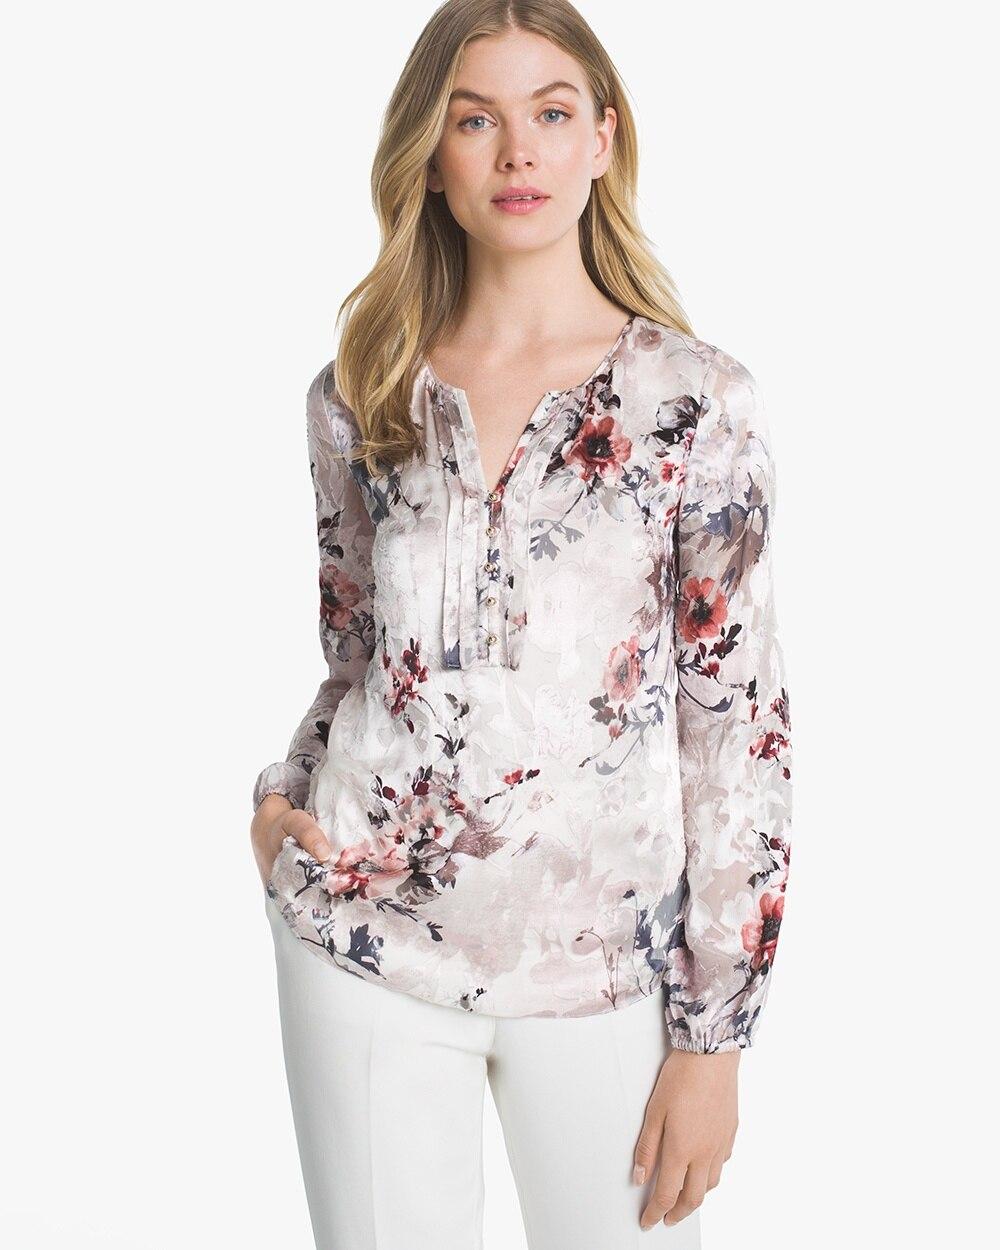 6e2fae9cd49ec7 Silk Burnout Floral Blouse - White House Black Market